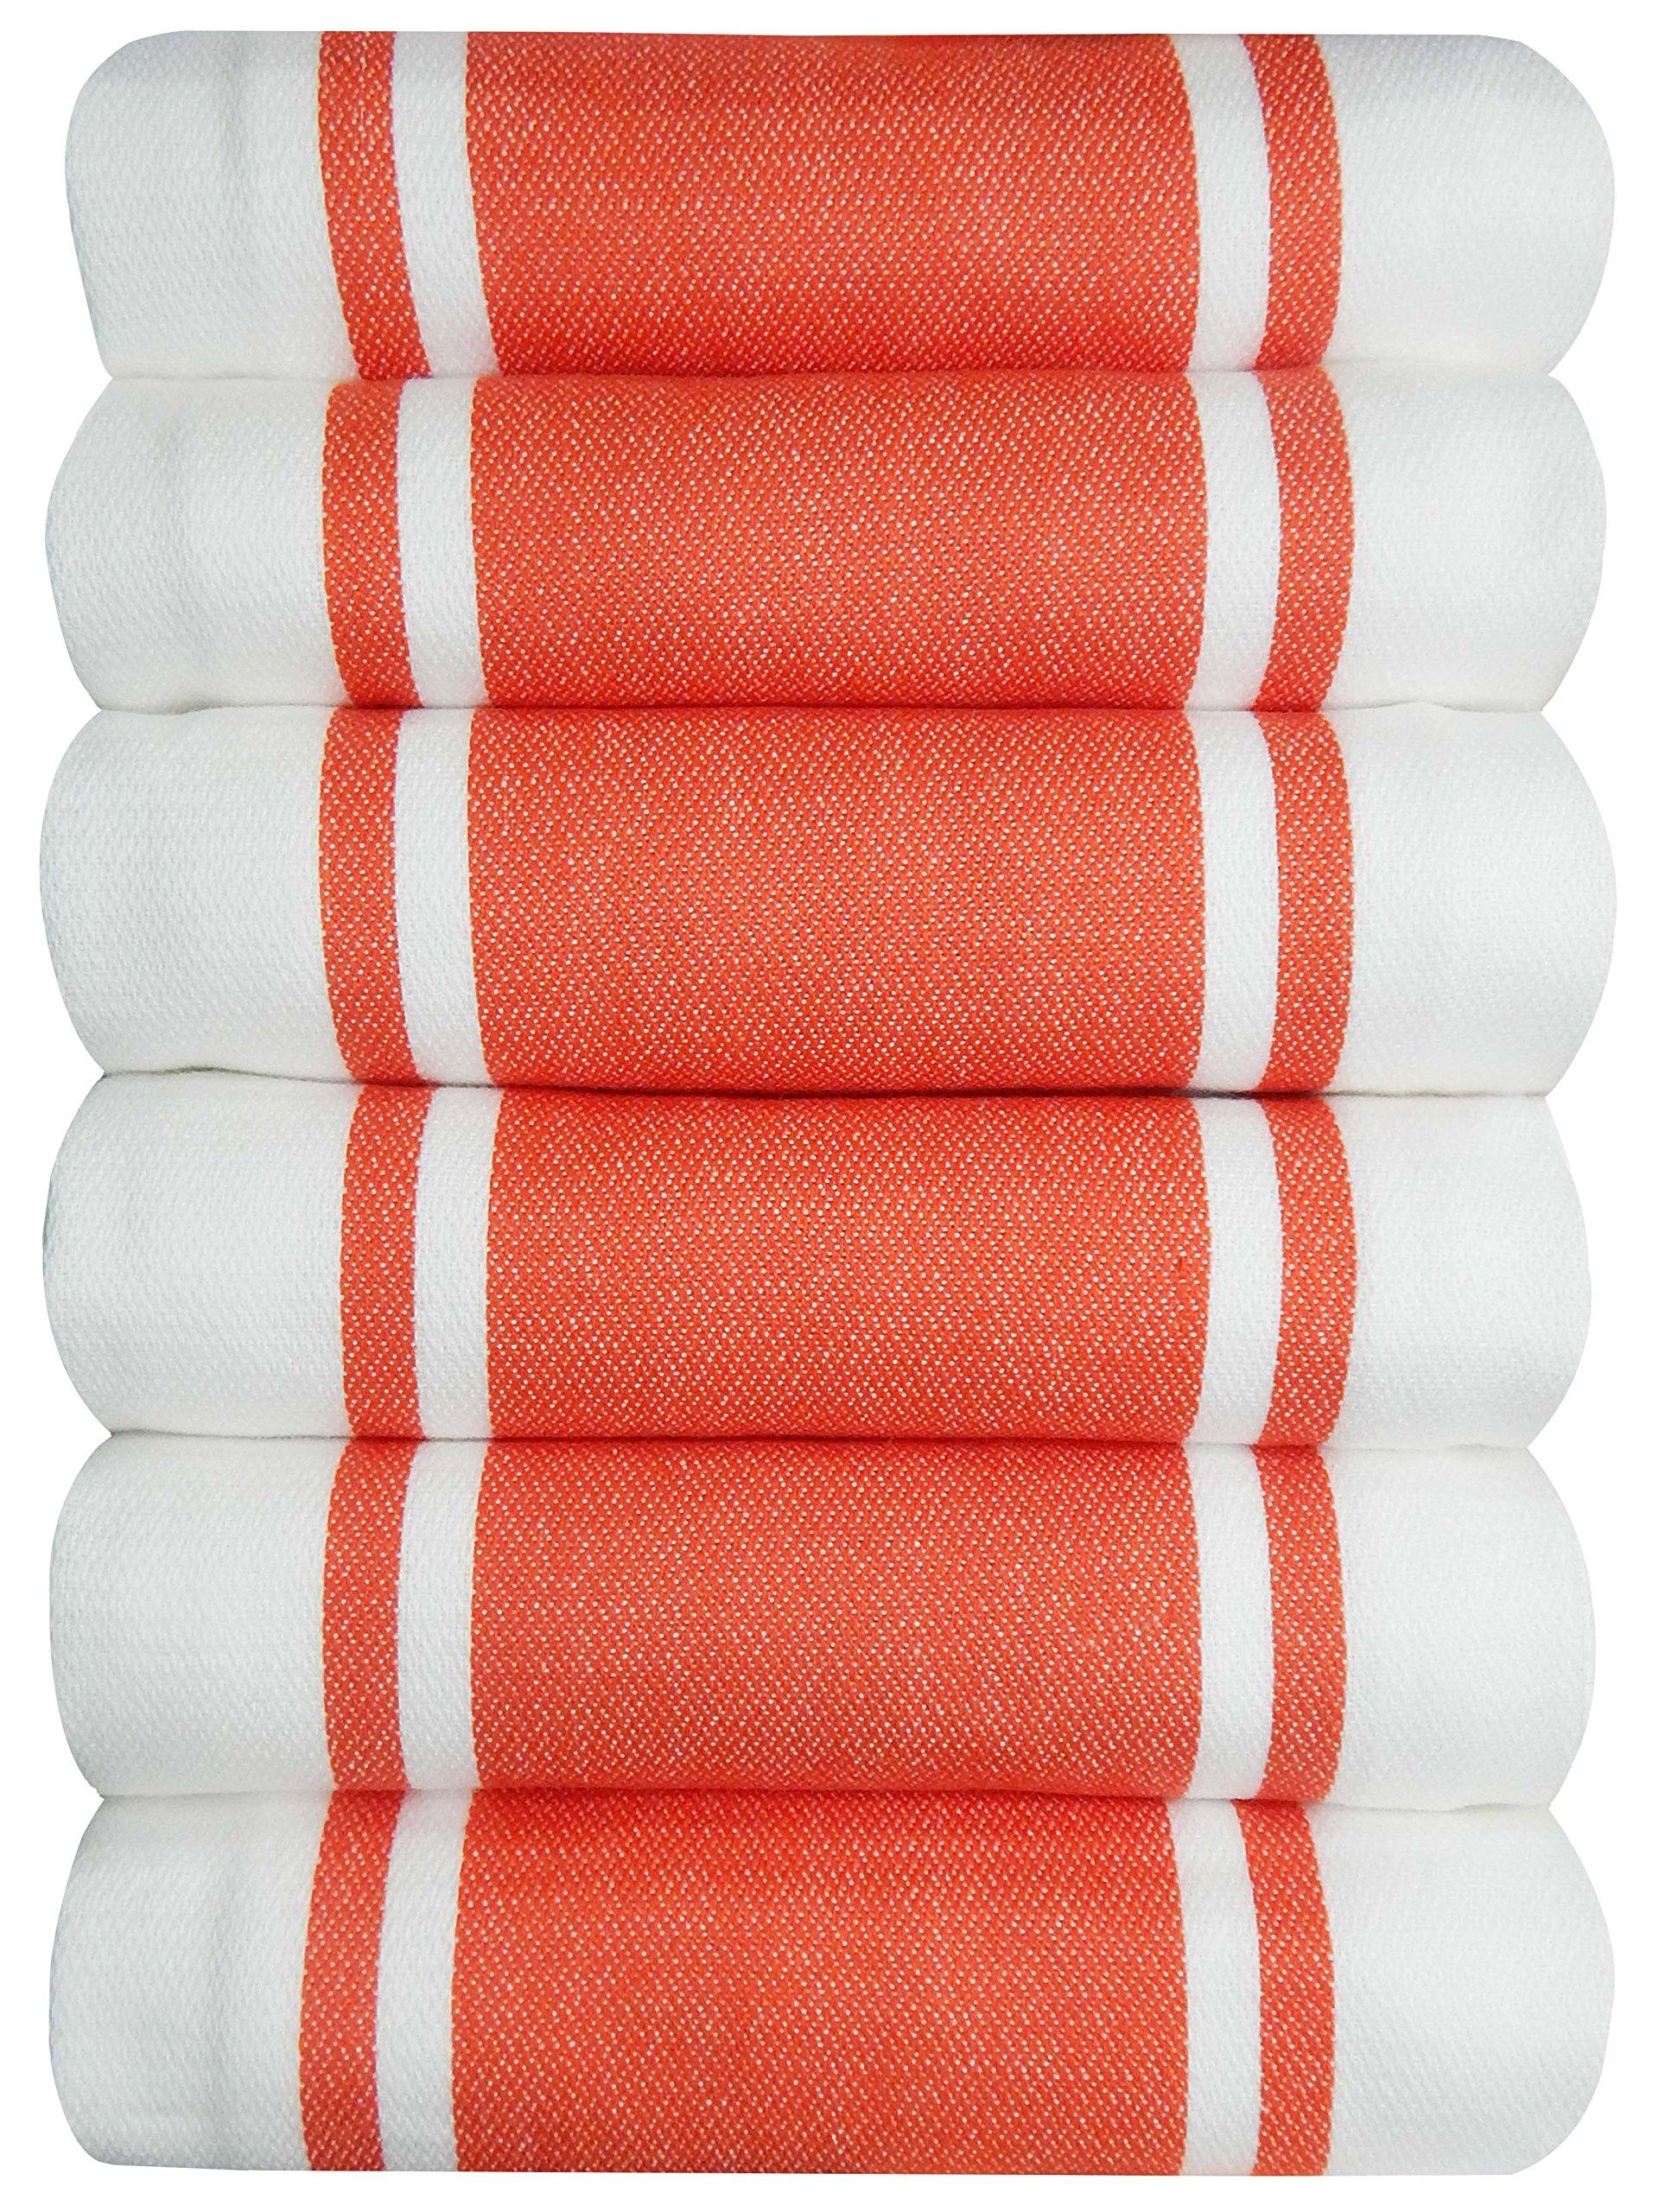 Tiny Break Dish Kitchen Towels Vintage Striped 100% Cotton Tea Towel 20 x 28 inch Set of 6, Spice